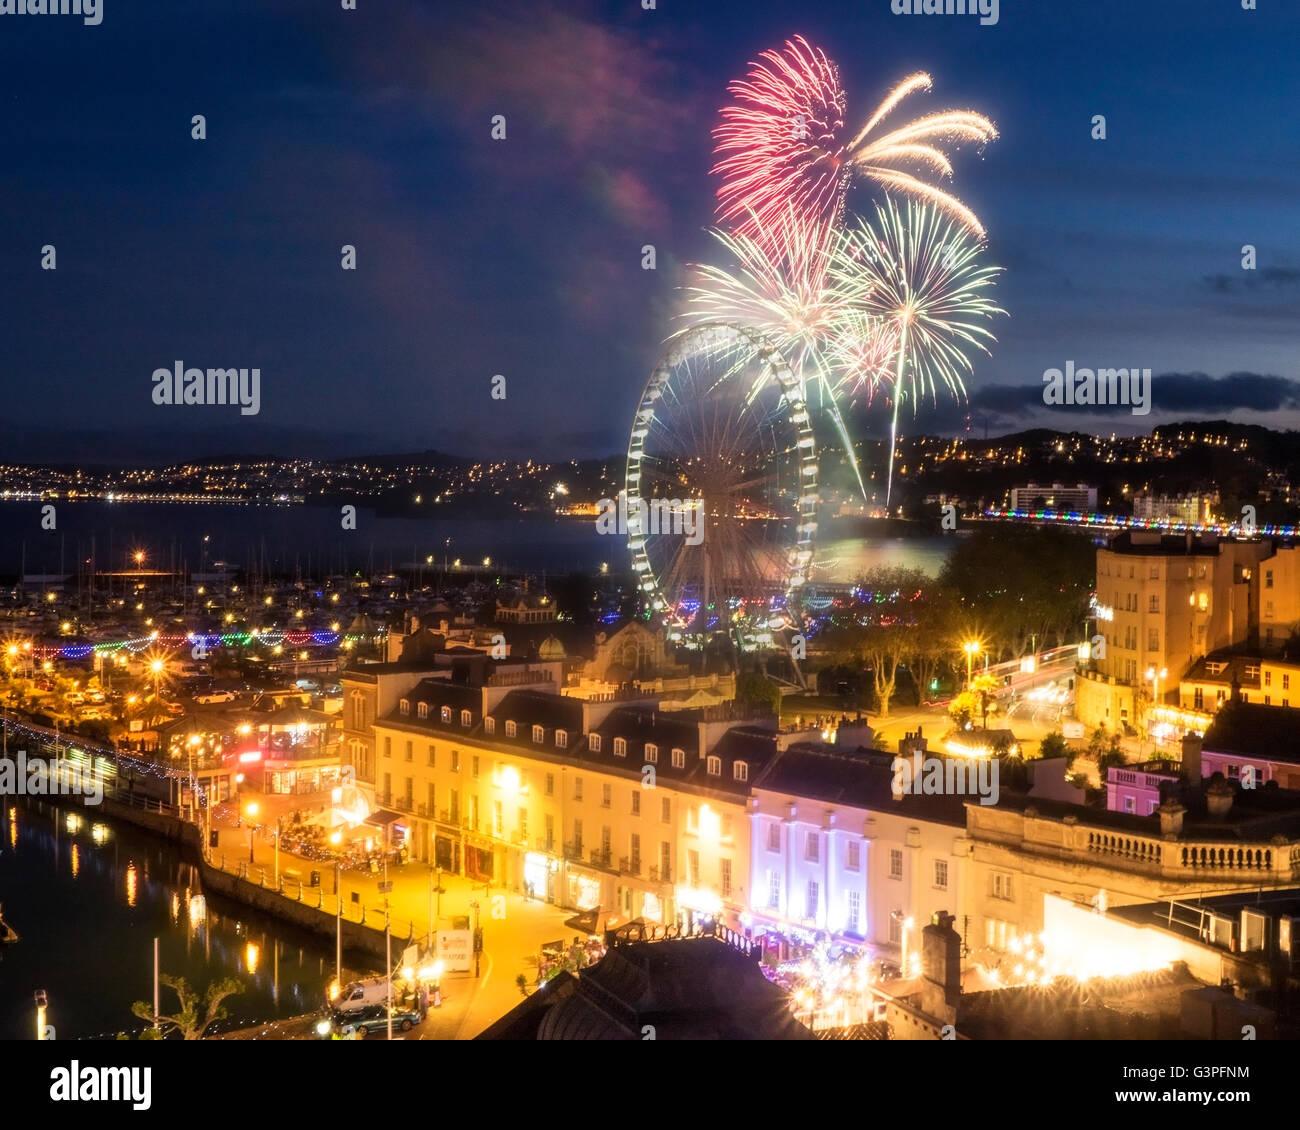 GB - DEVON (English Riviera): Fireworks over Torquay showing Paignton in background Stock Photo